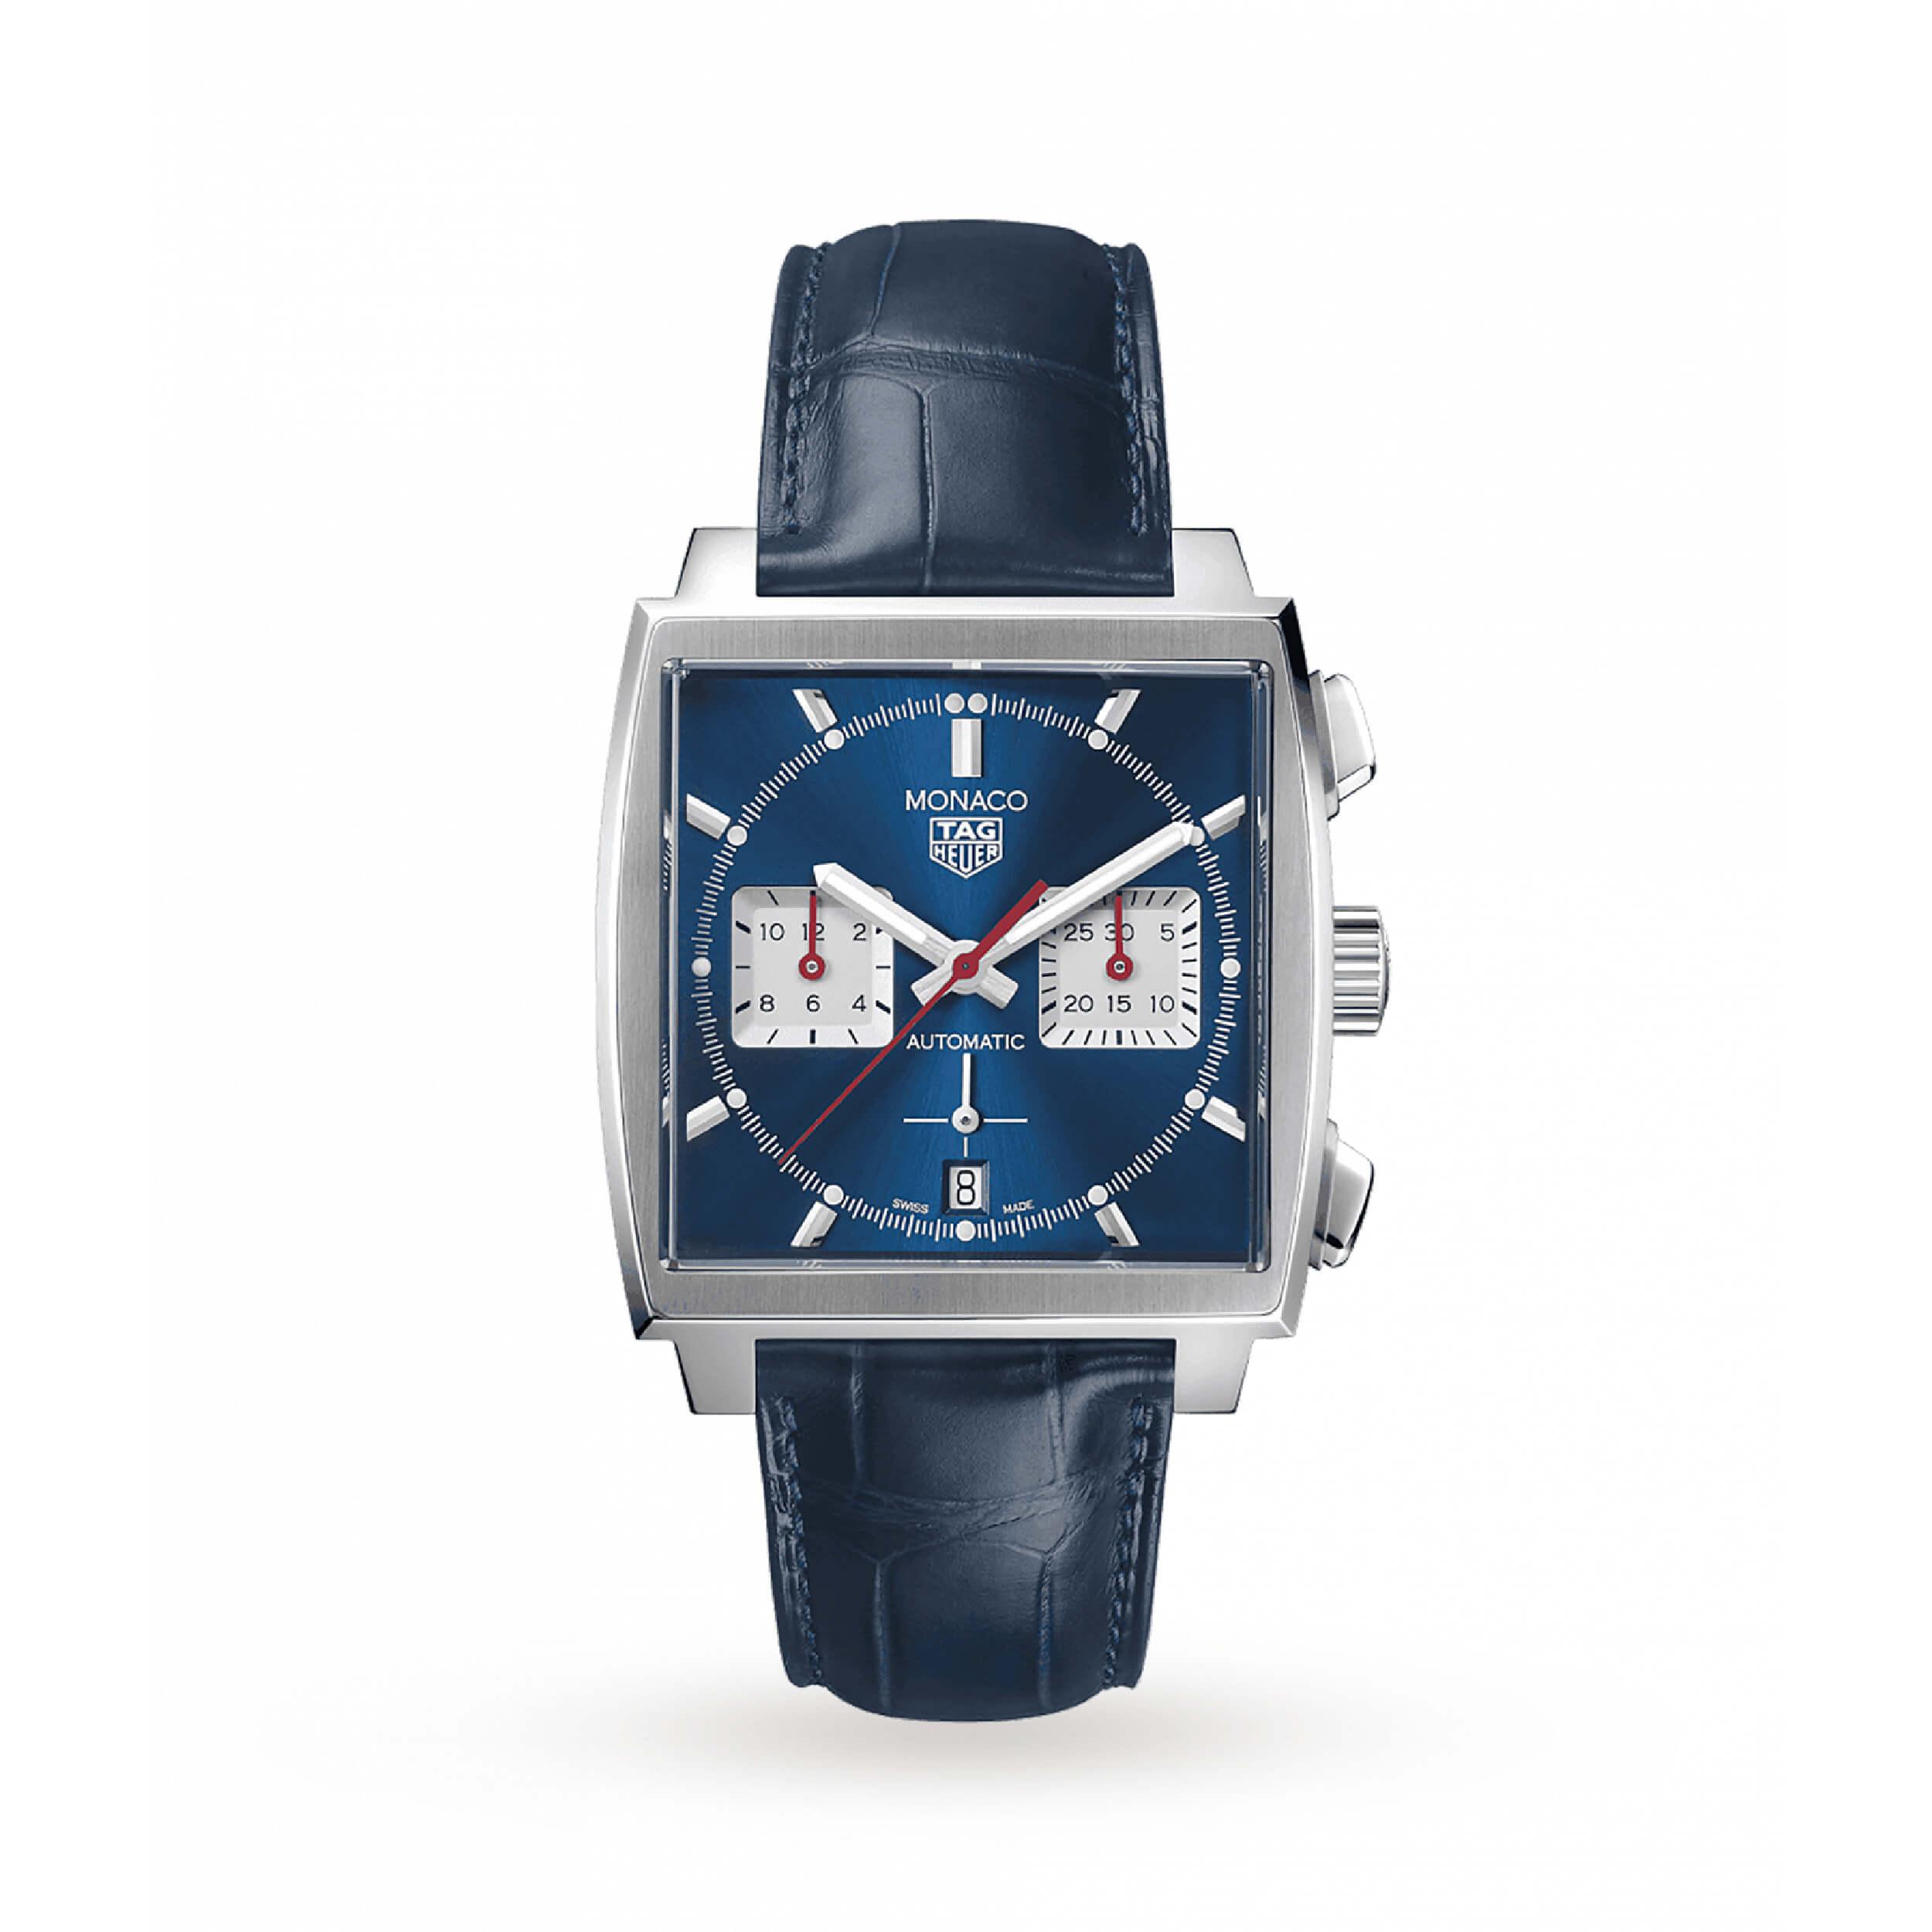 Tag Heuer Monaco | Wristwatches360